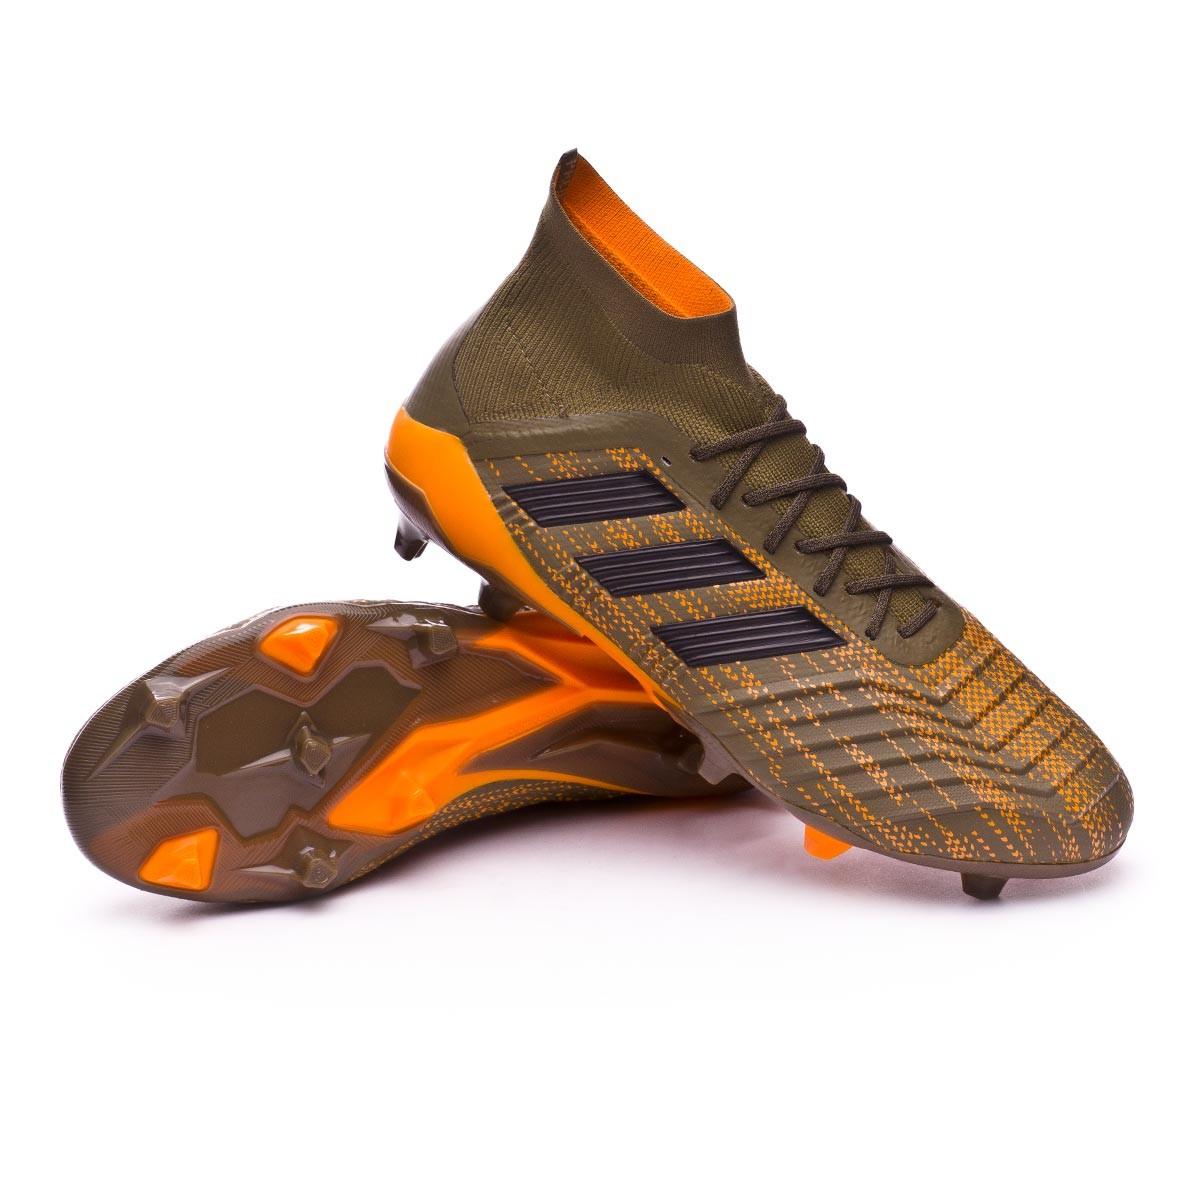 finest selection c8585 a3eb9 adidas Predator 18.1 FG Boot